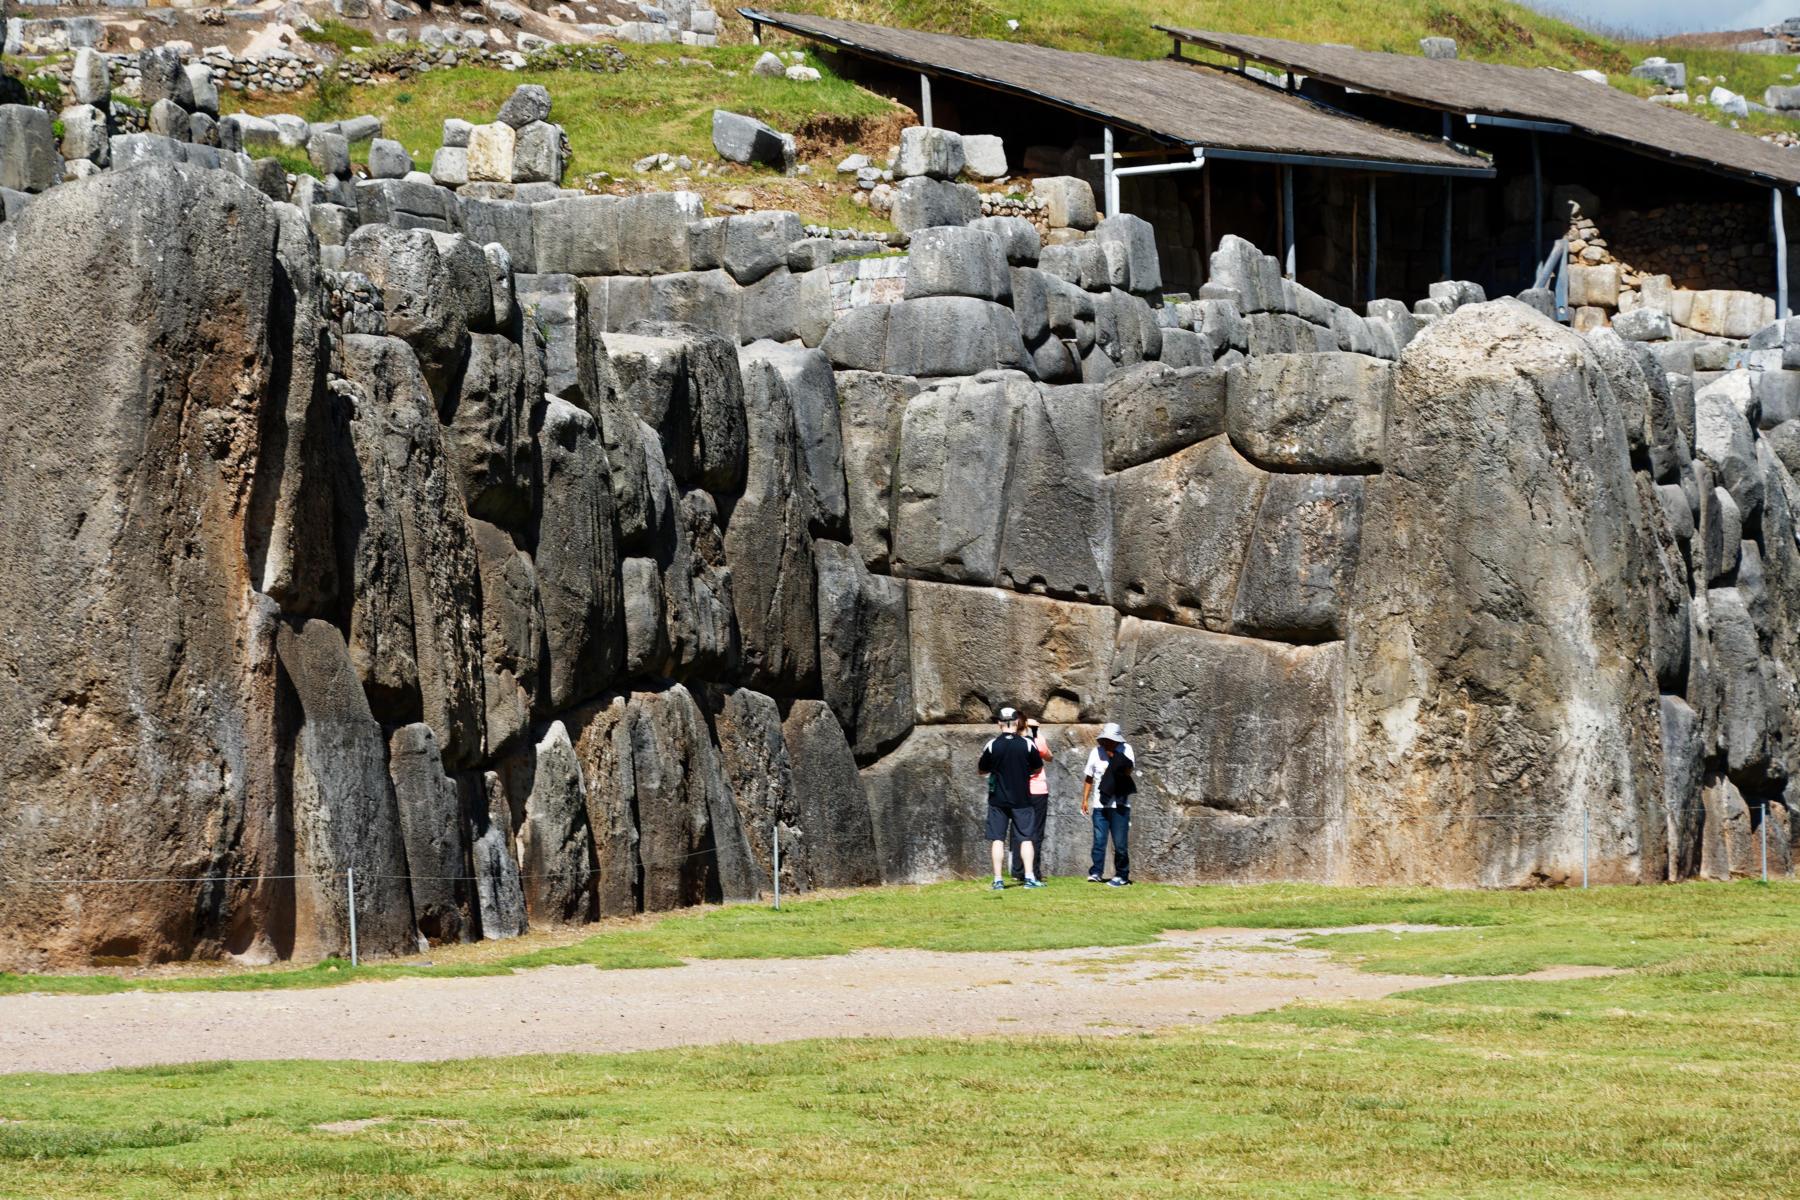 Saqsaywaman - Inca stonework